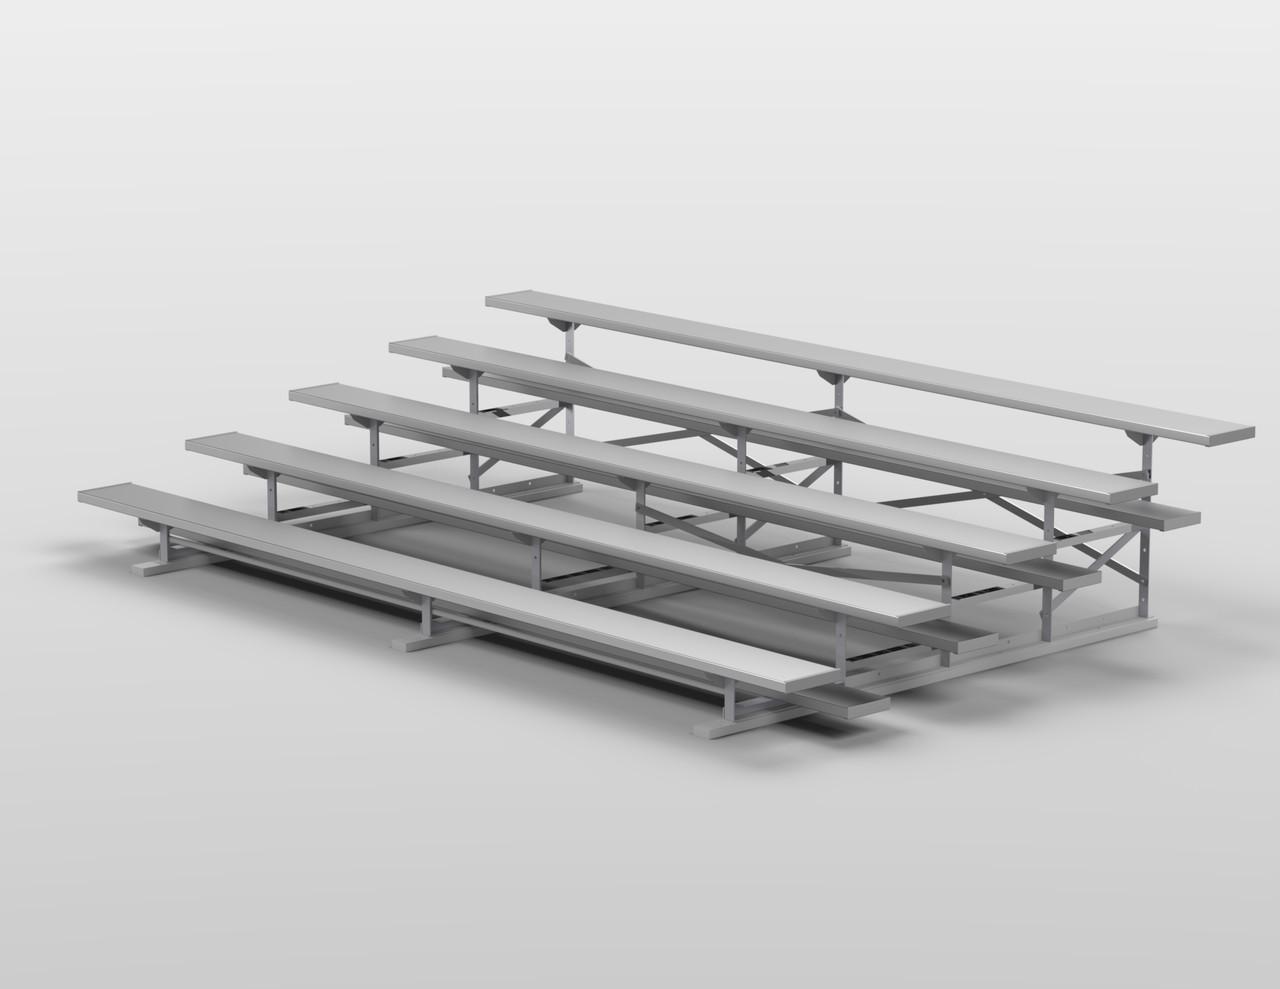 Aluminum Bleacher - 5 Row